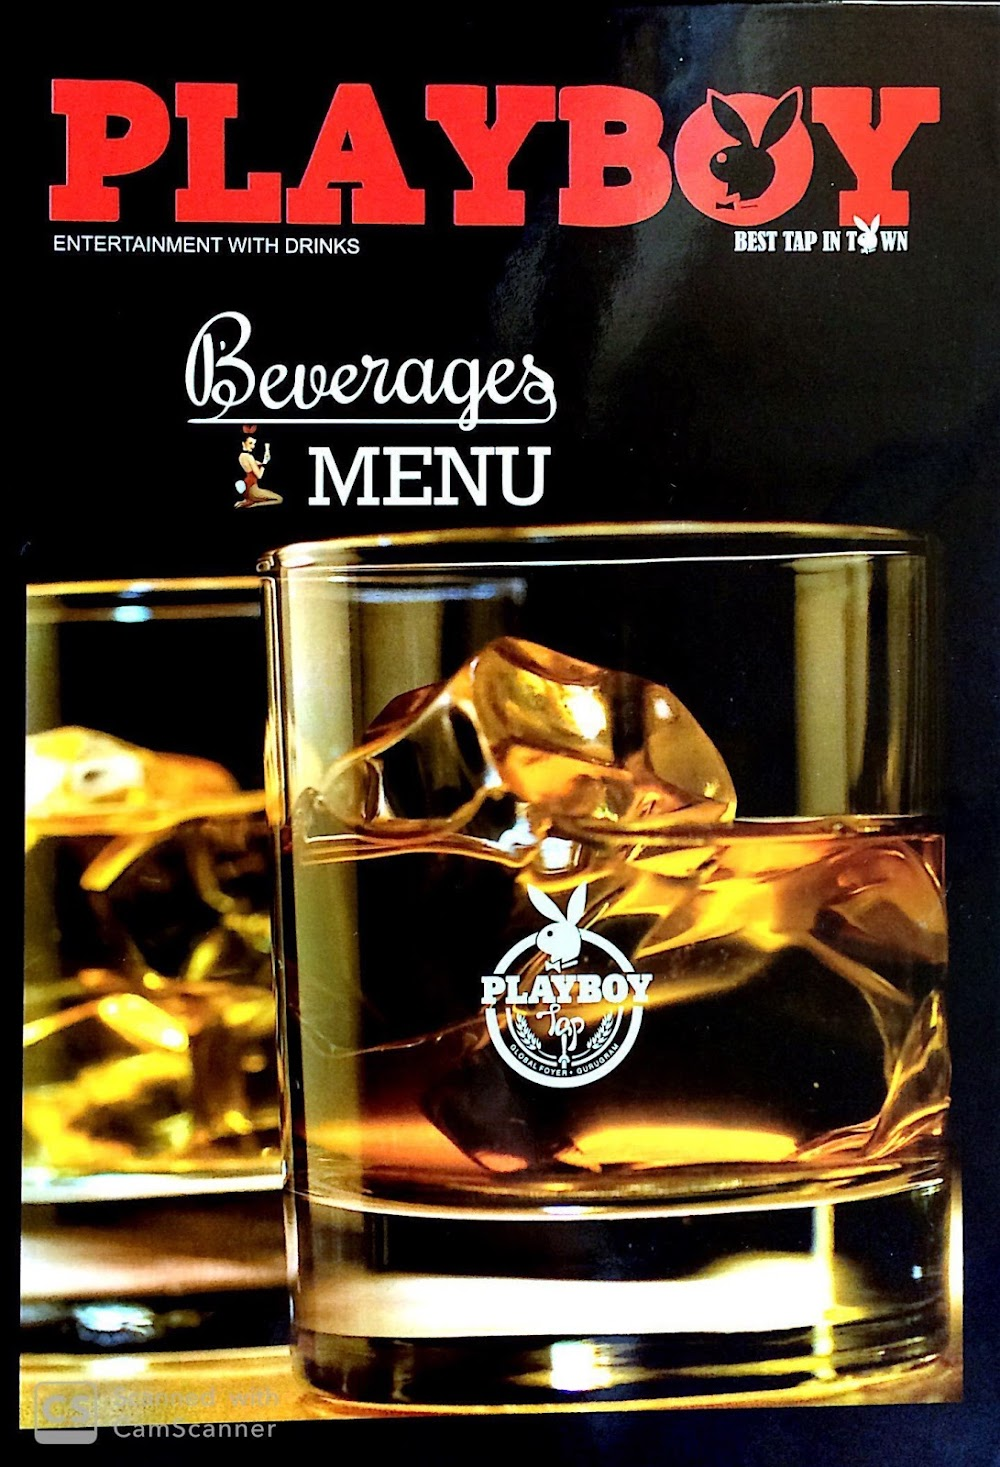 Playboy Tap menu 2